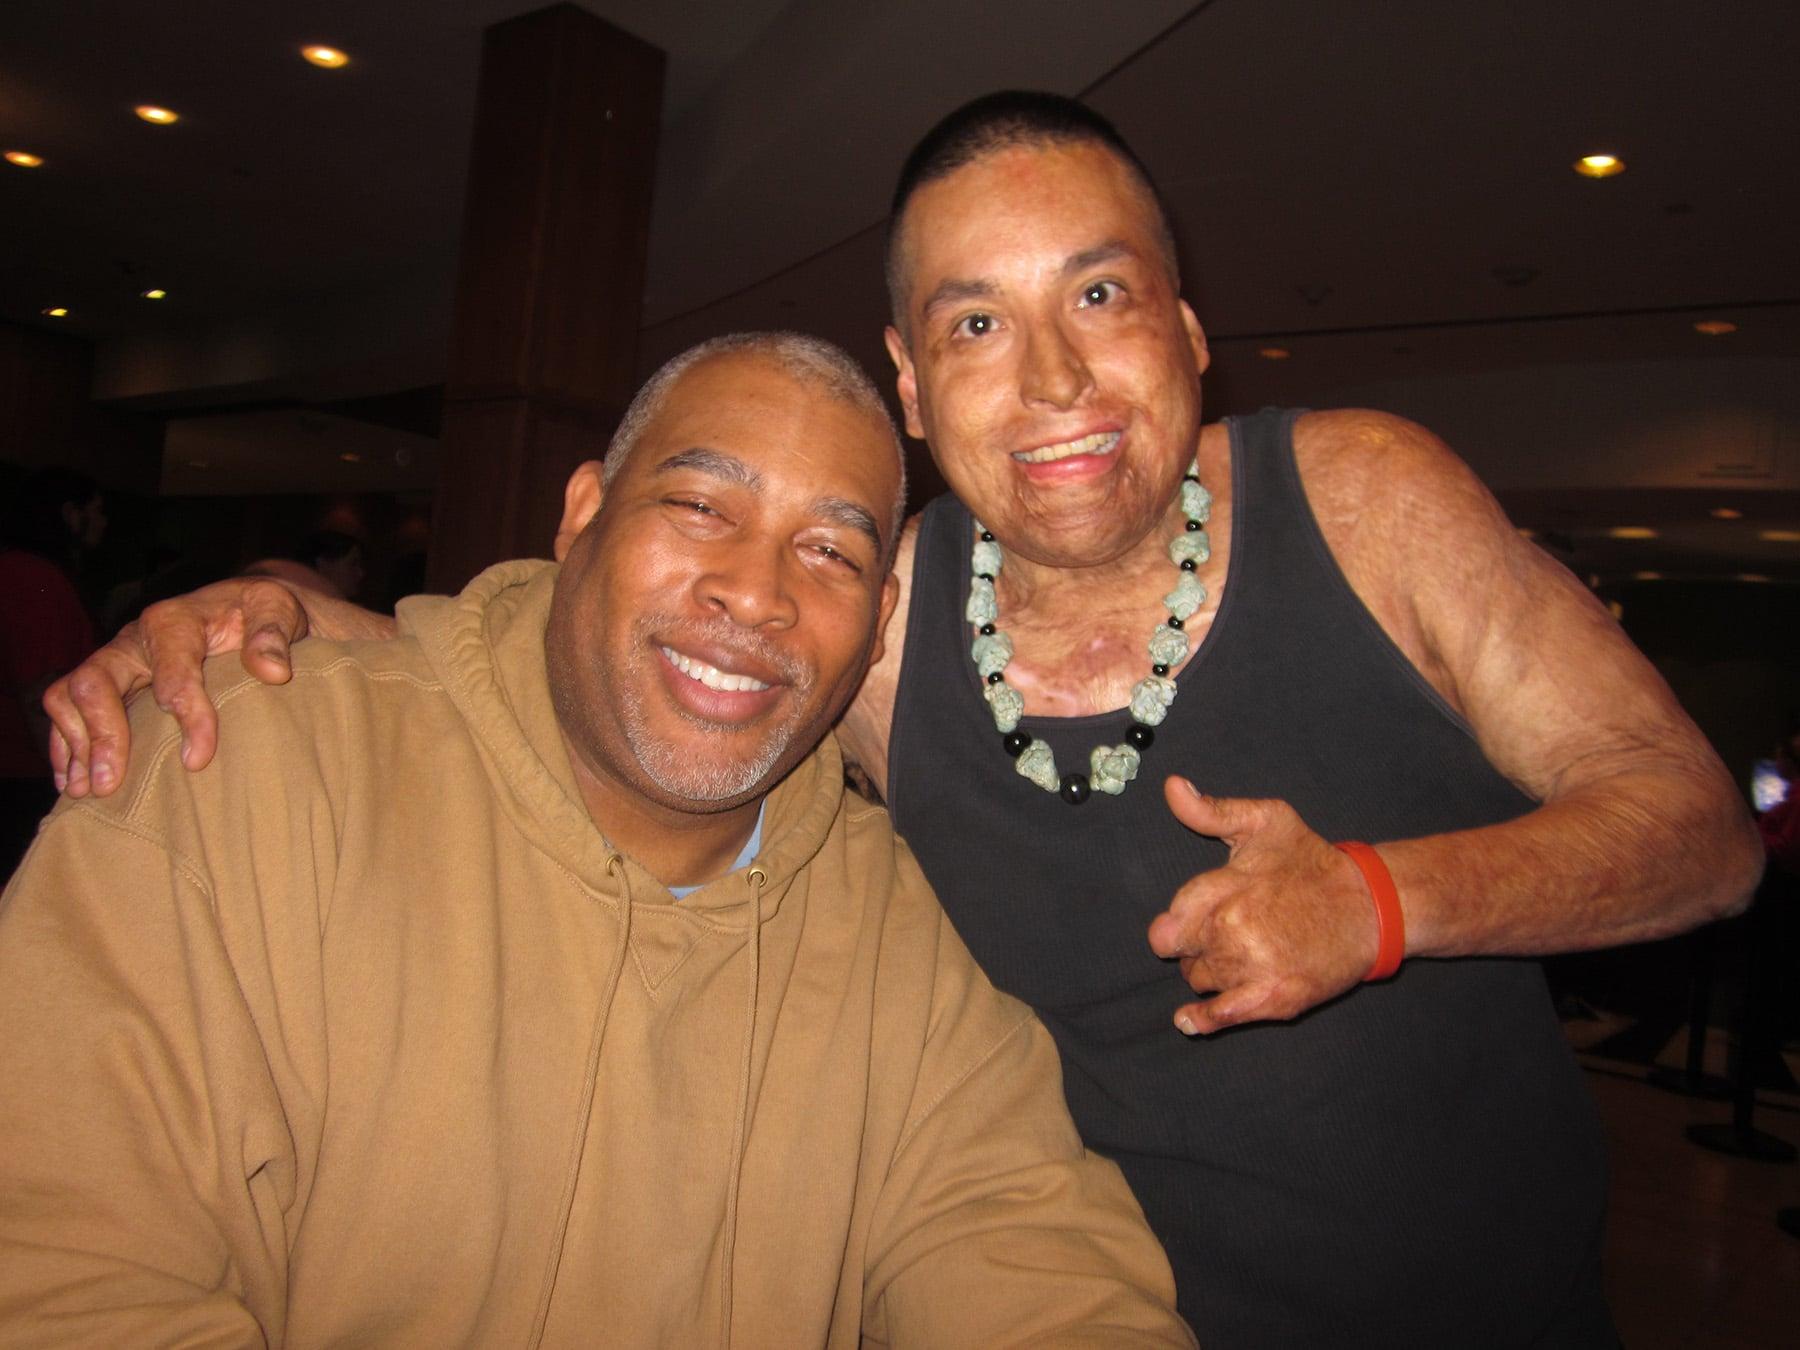 Masterchef contestants Kevin and Rudy.